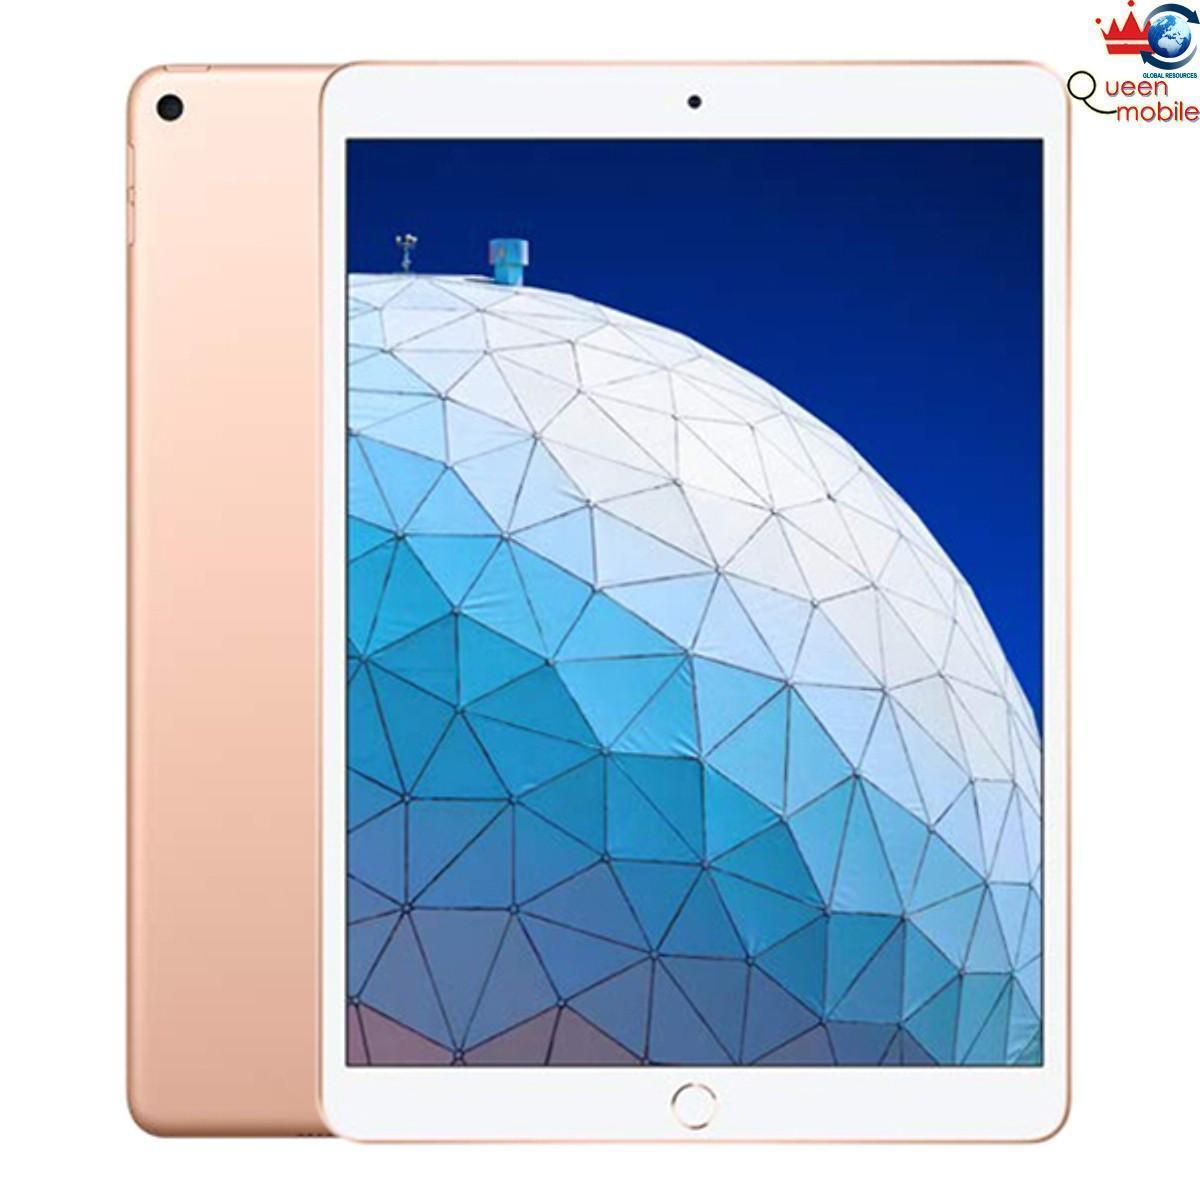 Máy tính bảng Ipad Air 10.5 WiFi + Cellular 64GB New 2019 - (Màu gray)